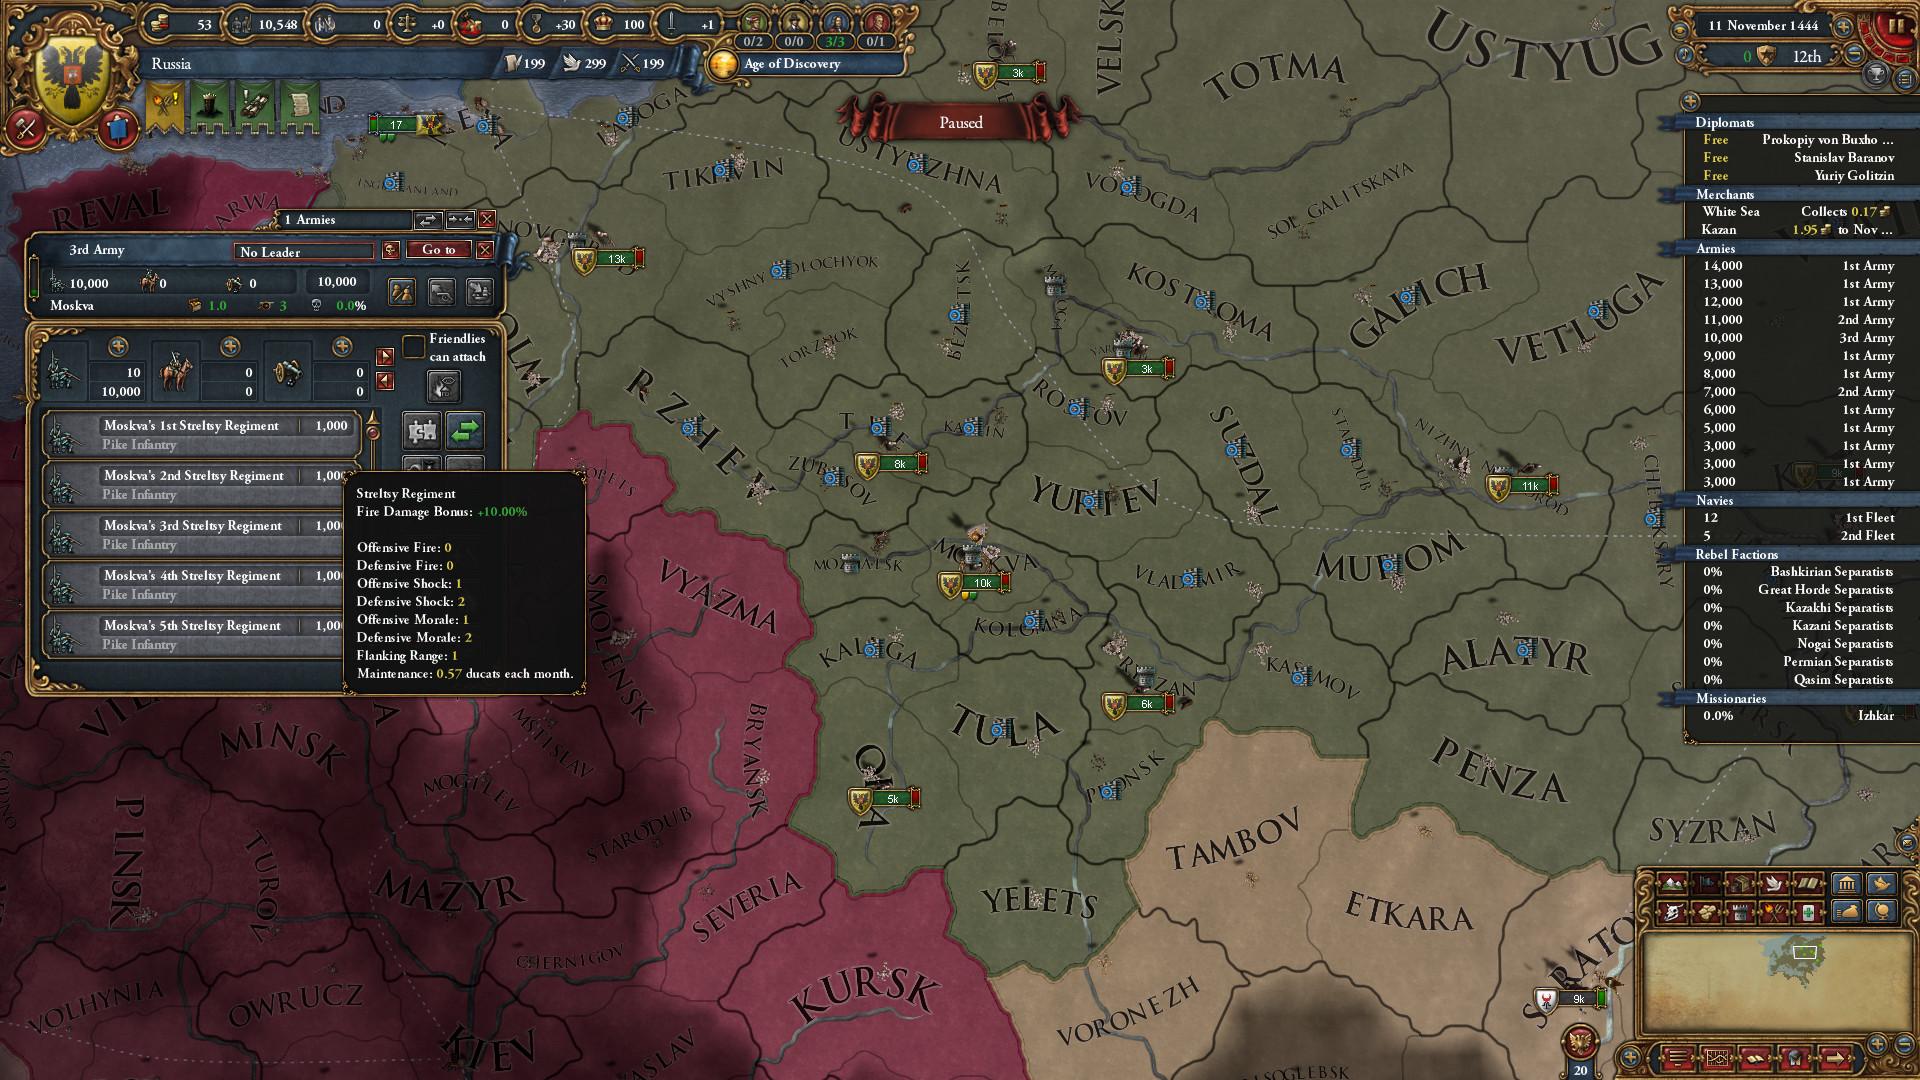 Europa Universalis IV: Third Rome Screenshot 2